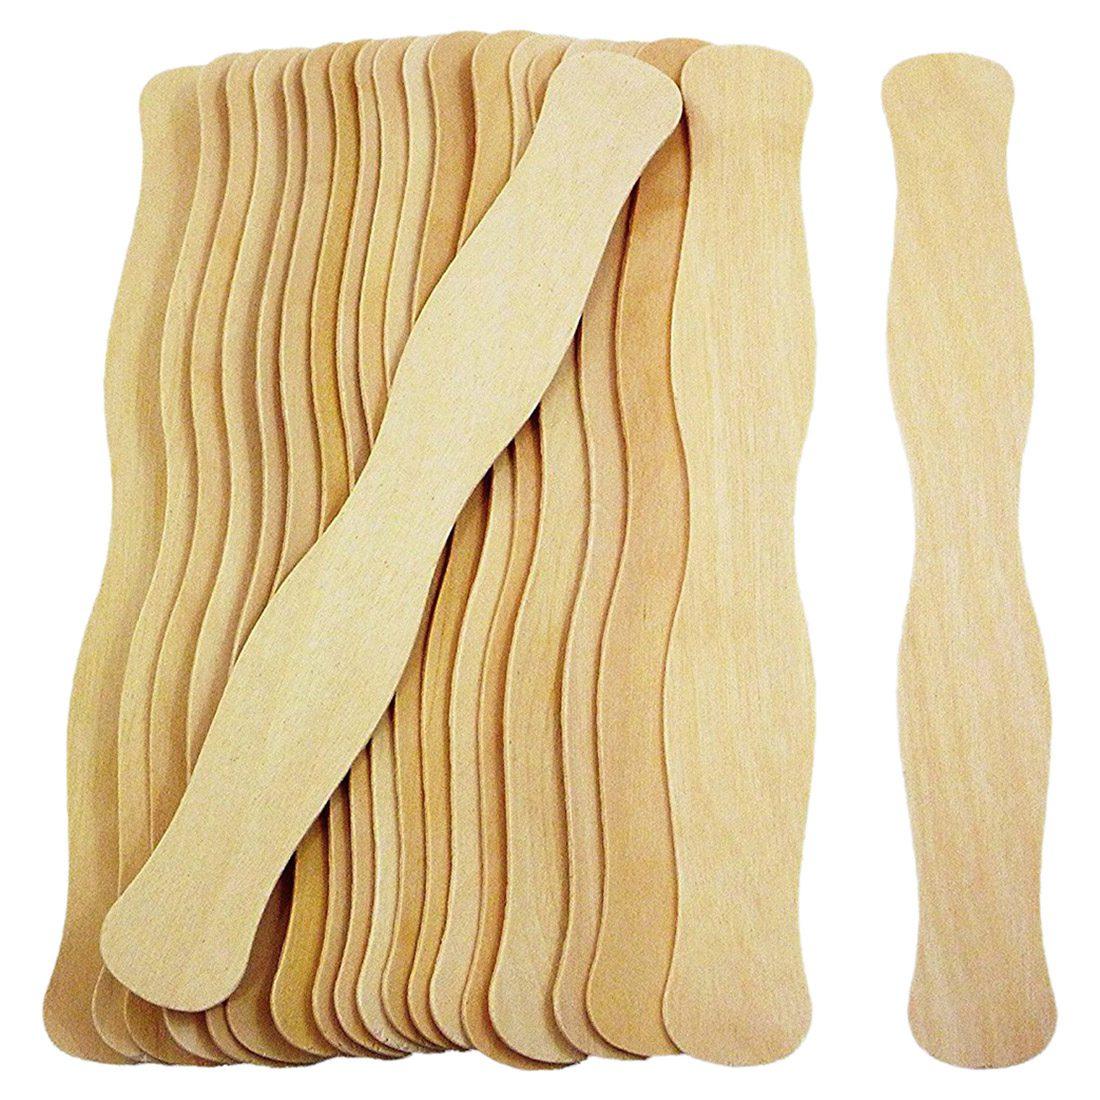 200x Jumbo 8 Inch Popsicles Long Wooden Amp Wavy Bulk